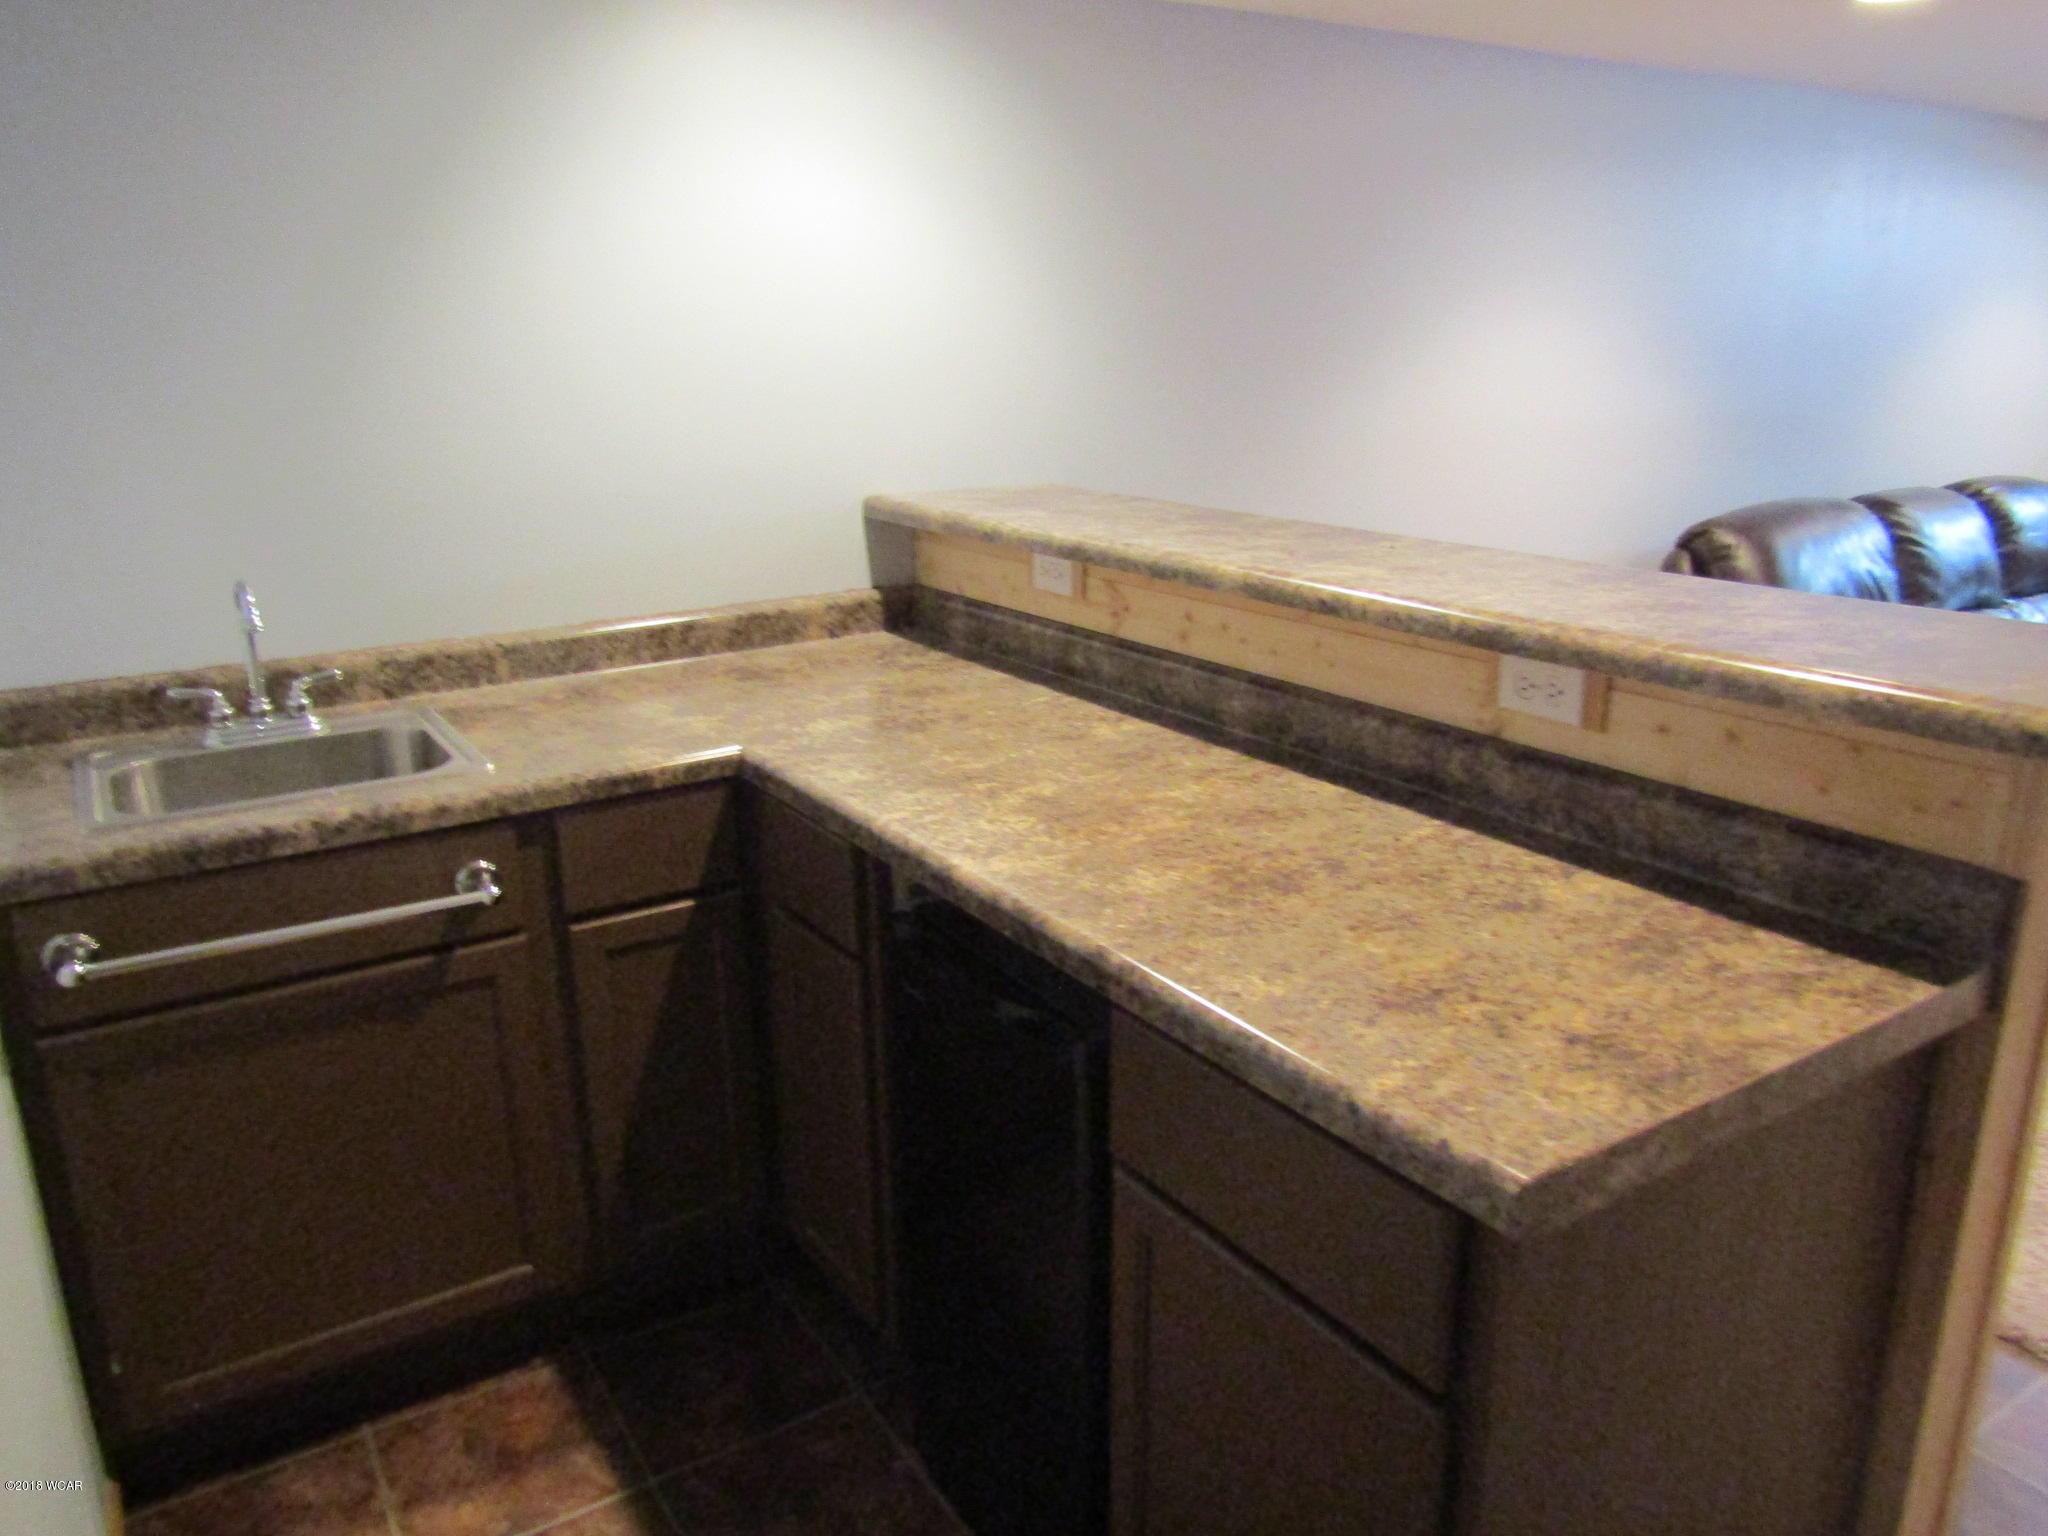 720 10th Street,Benson,4 Bedrooms Bedrooms,2 BathroomsBathrooms,Single Family,10th Street,6032633